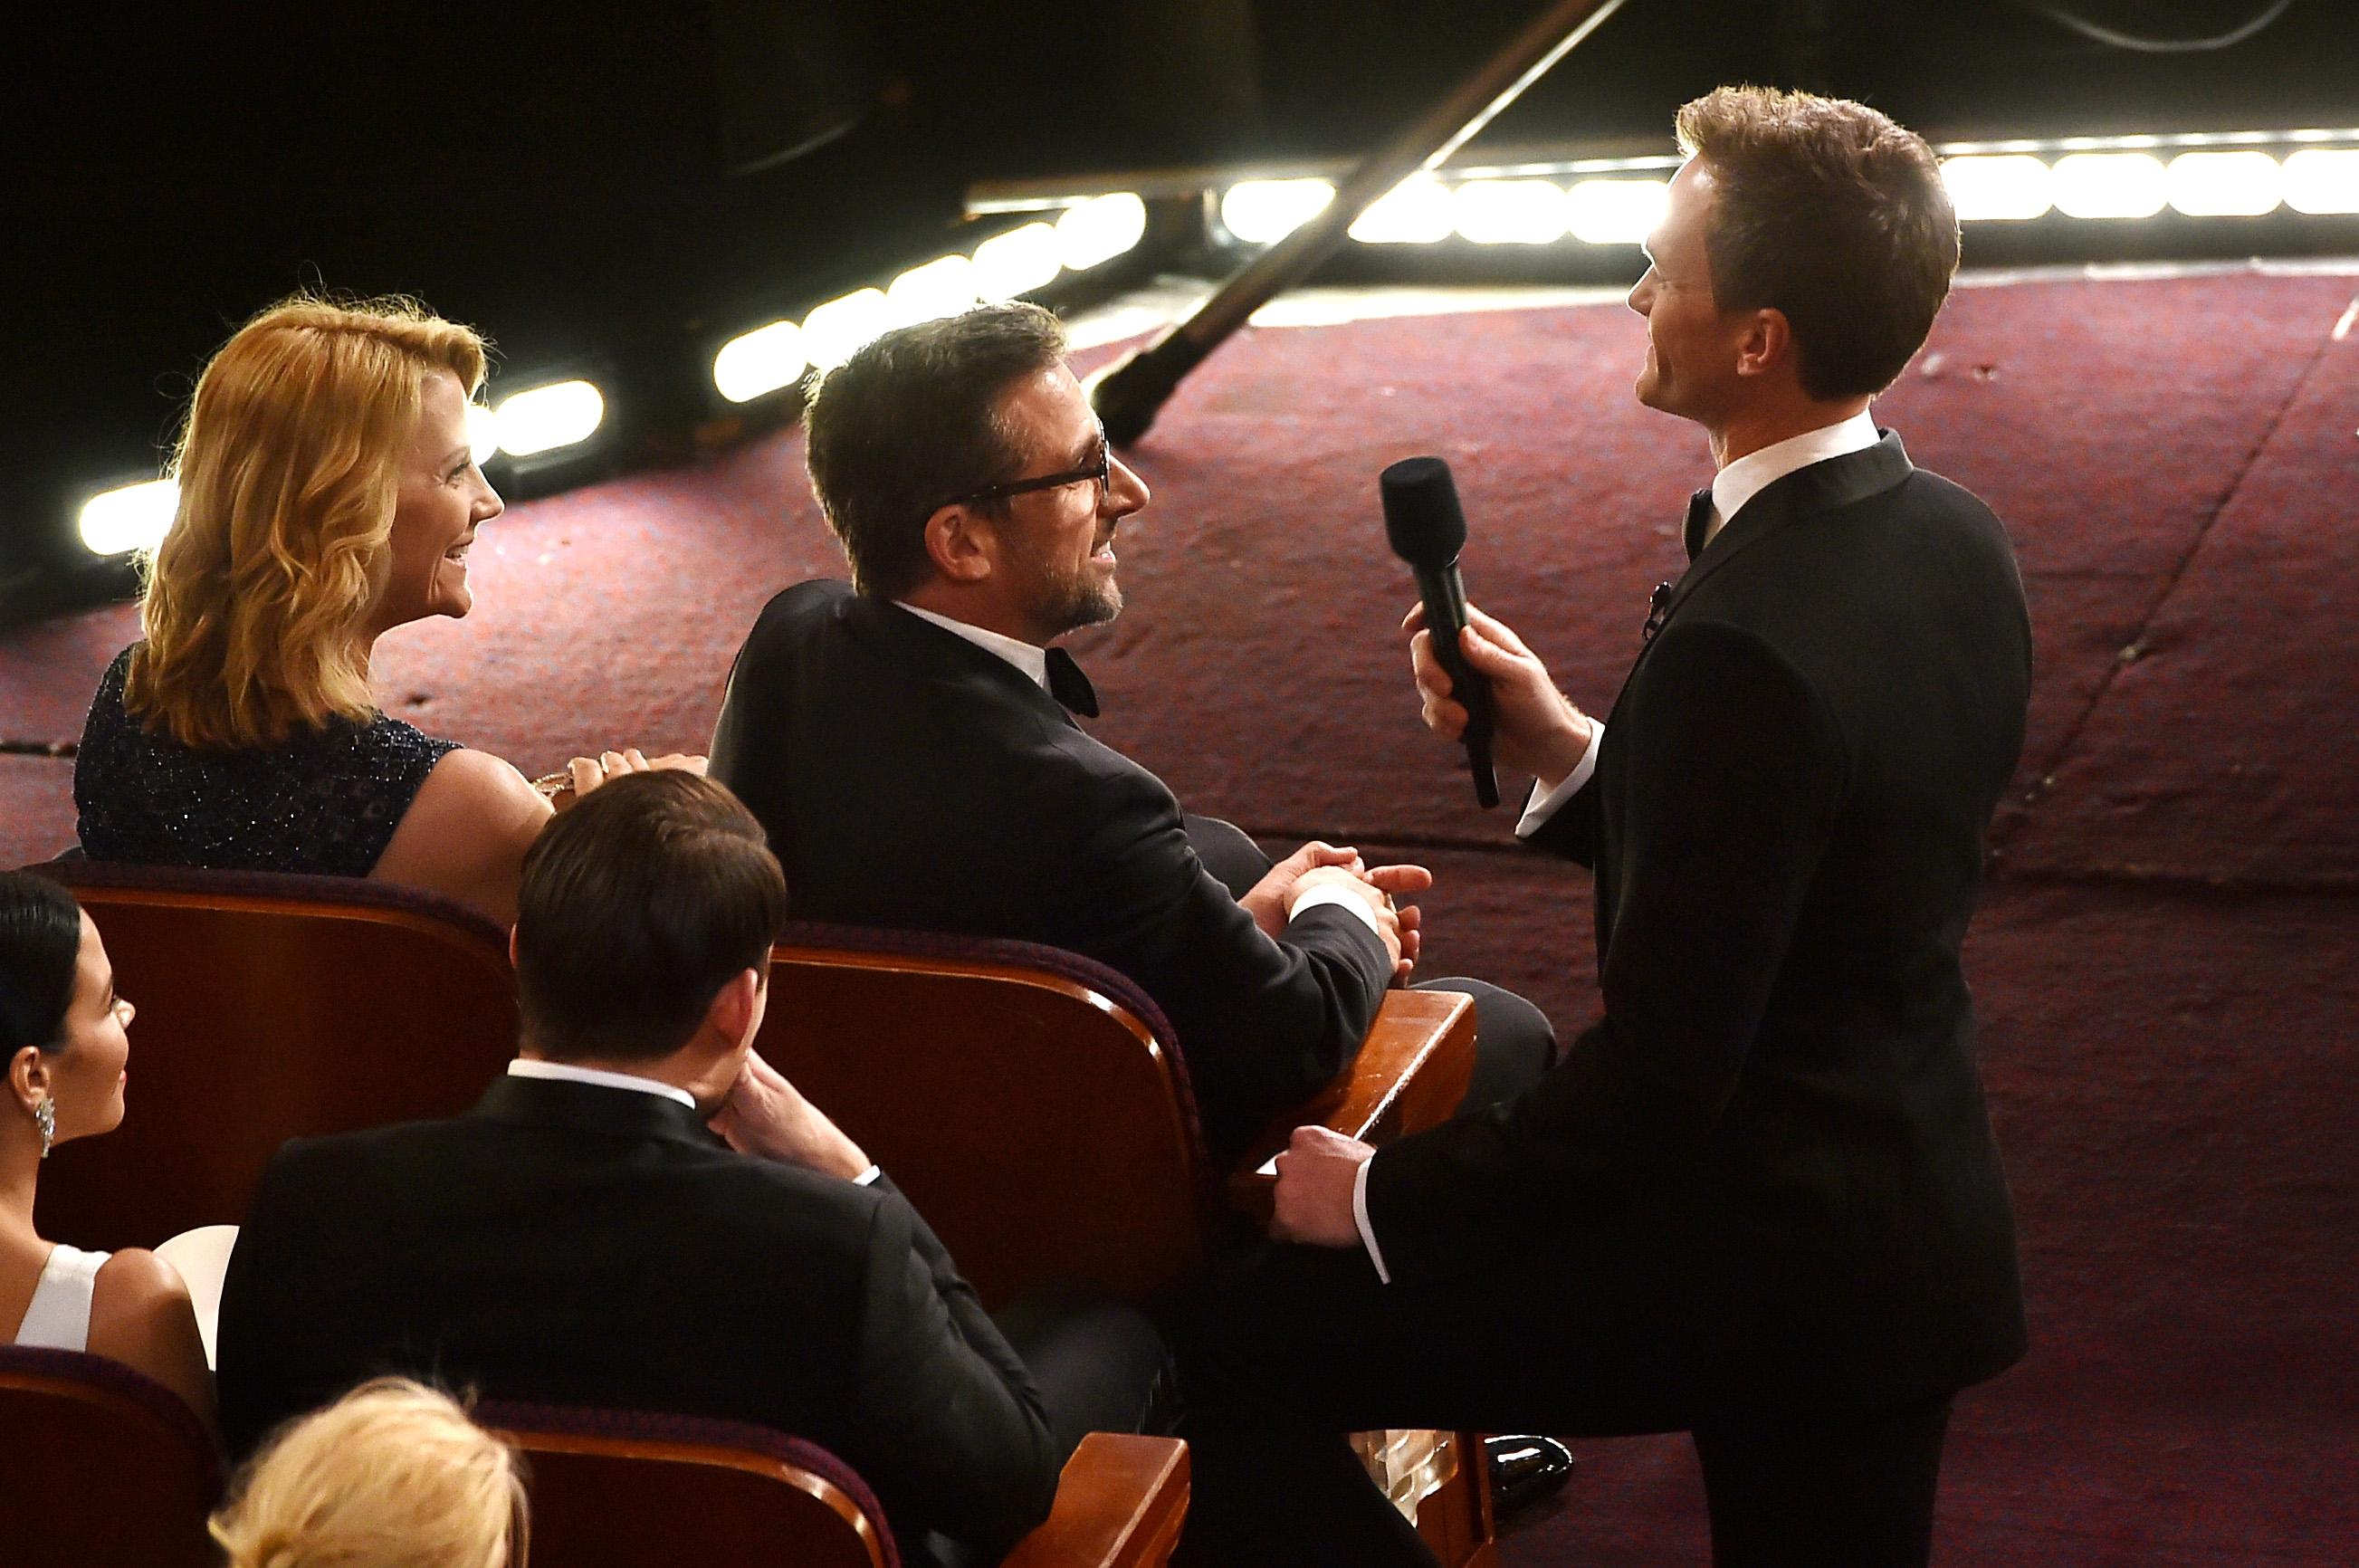 HOLLYWOOD, CA - FEBRUARY 22:  Host Neil Patrick Harris (R) talks with actor Steve Carell during the 87th Annual Academy Award